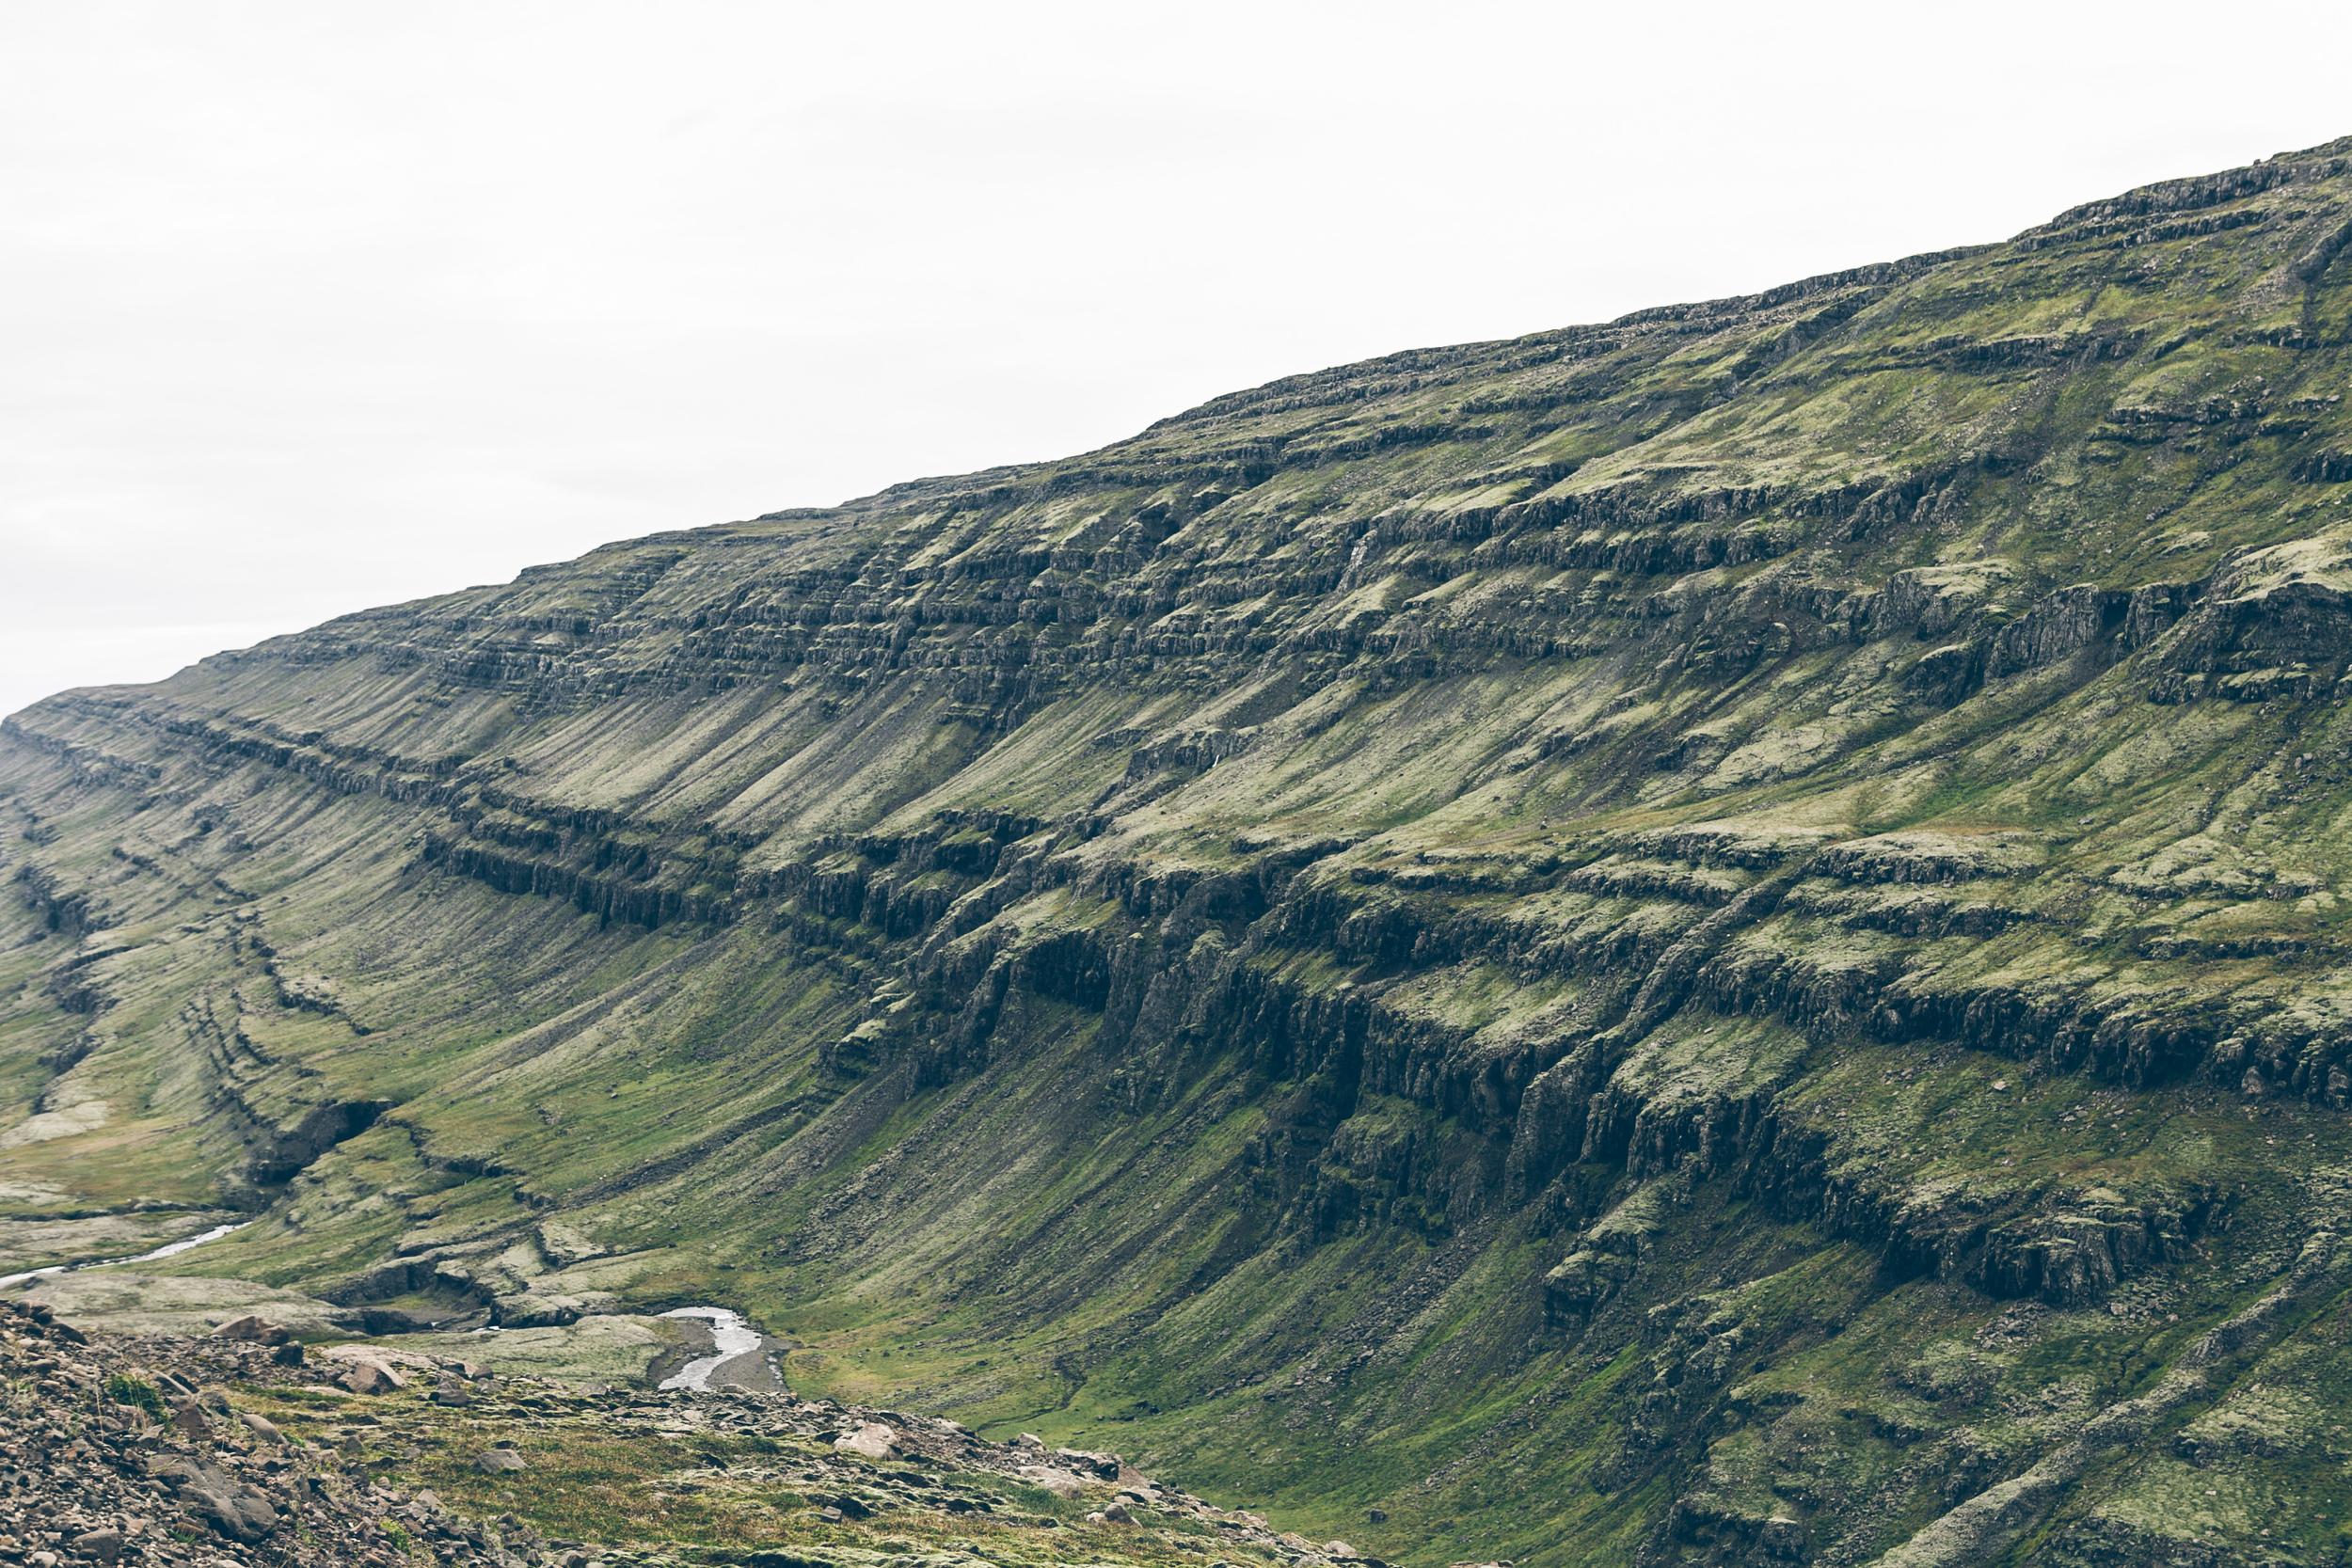 Terrain along the Öxi Mountain Pass